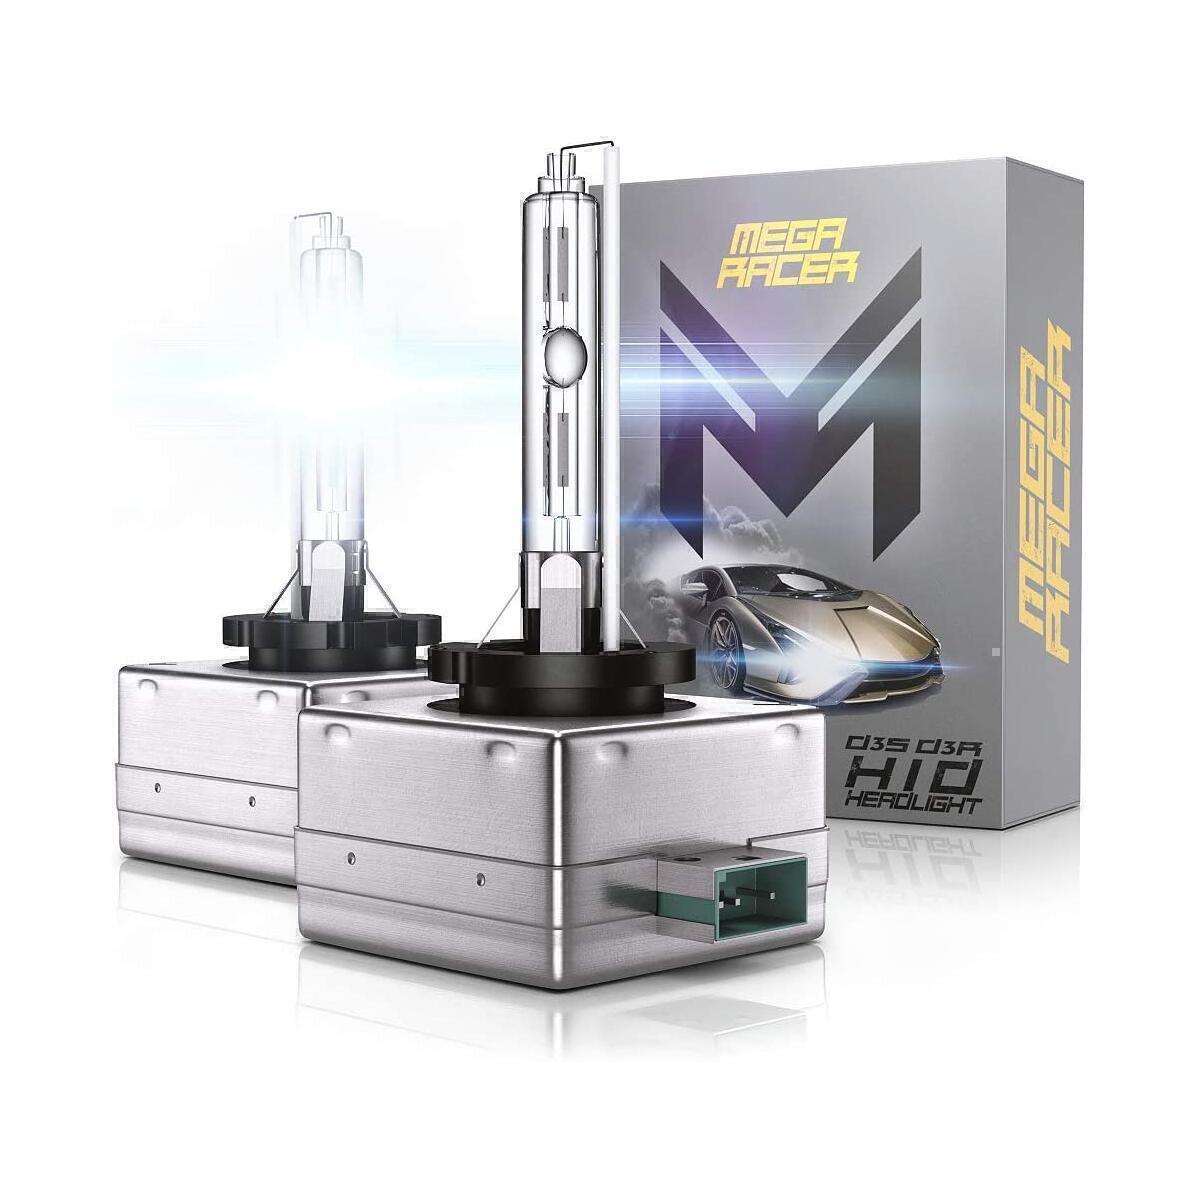 Mega Racer D3C/D3R/D3S HID Bulb Headlights for Low Beam High Beam 35W 6000K Diamond White 8000 Lumens Xenon Headlights IP68 Waterproof, Pack of 2